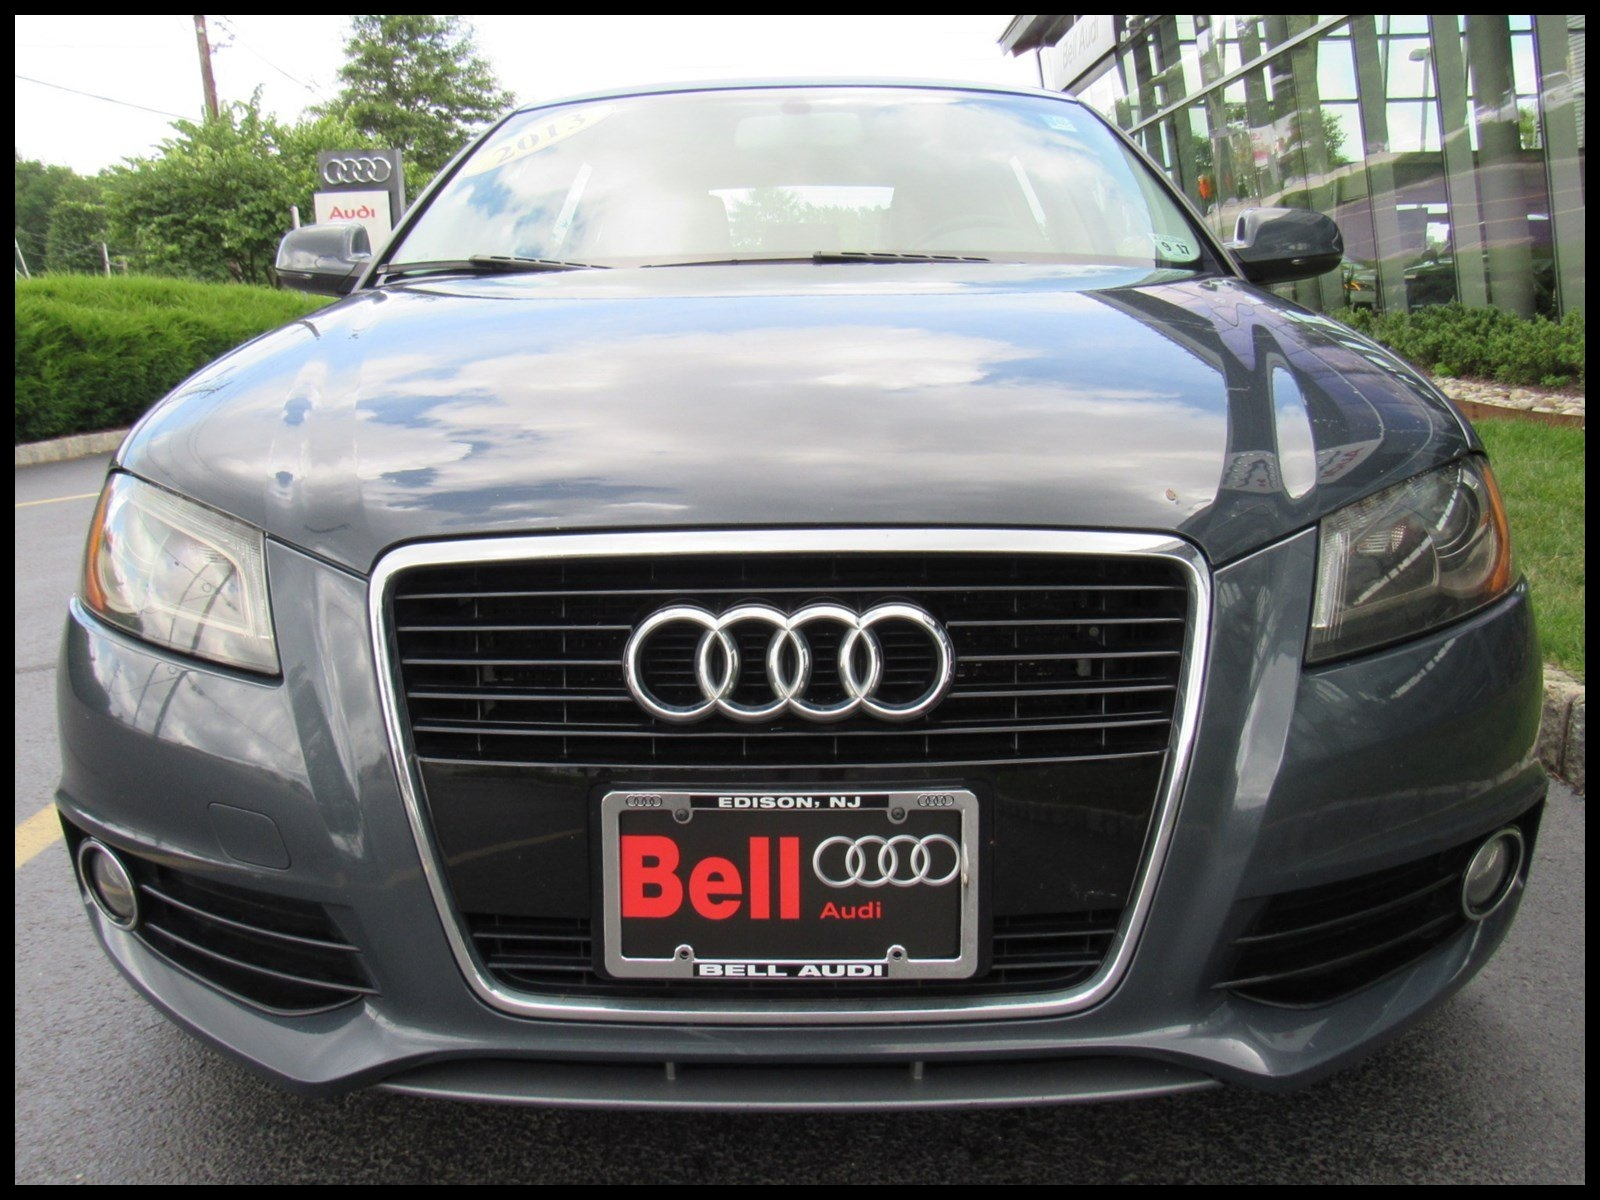 Bell Audi Edison NJ Car Dealership and Auto Financing